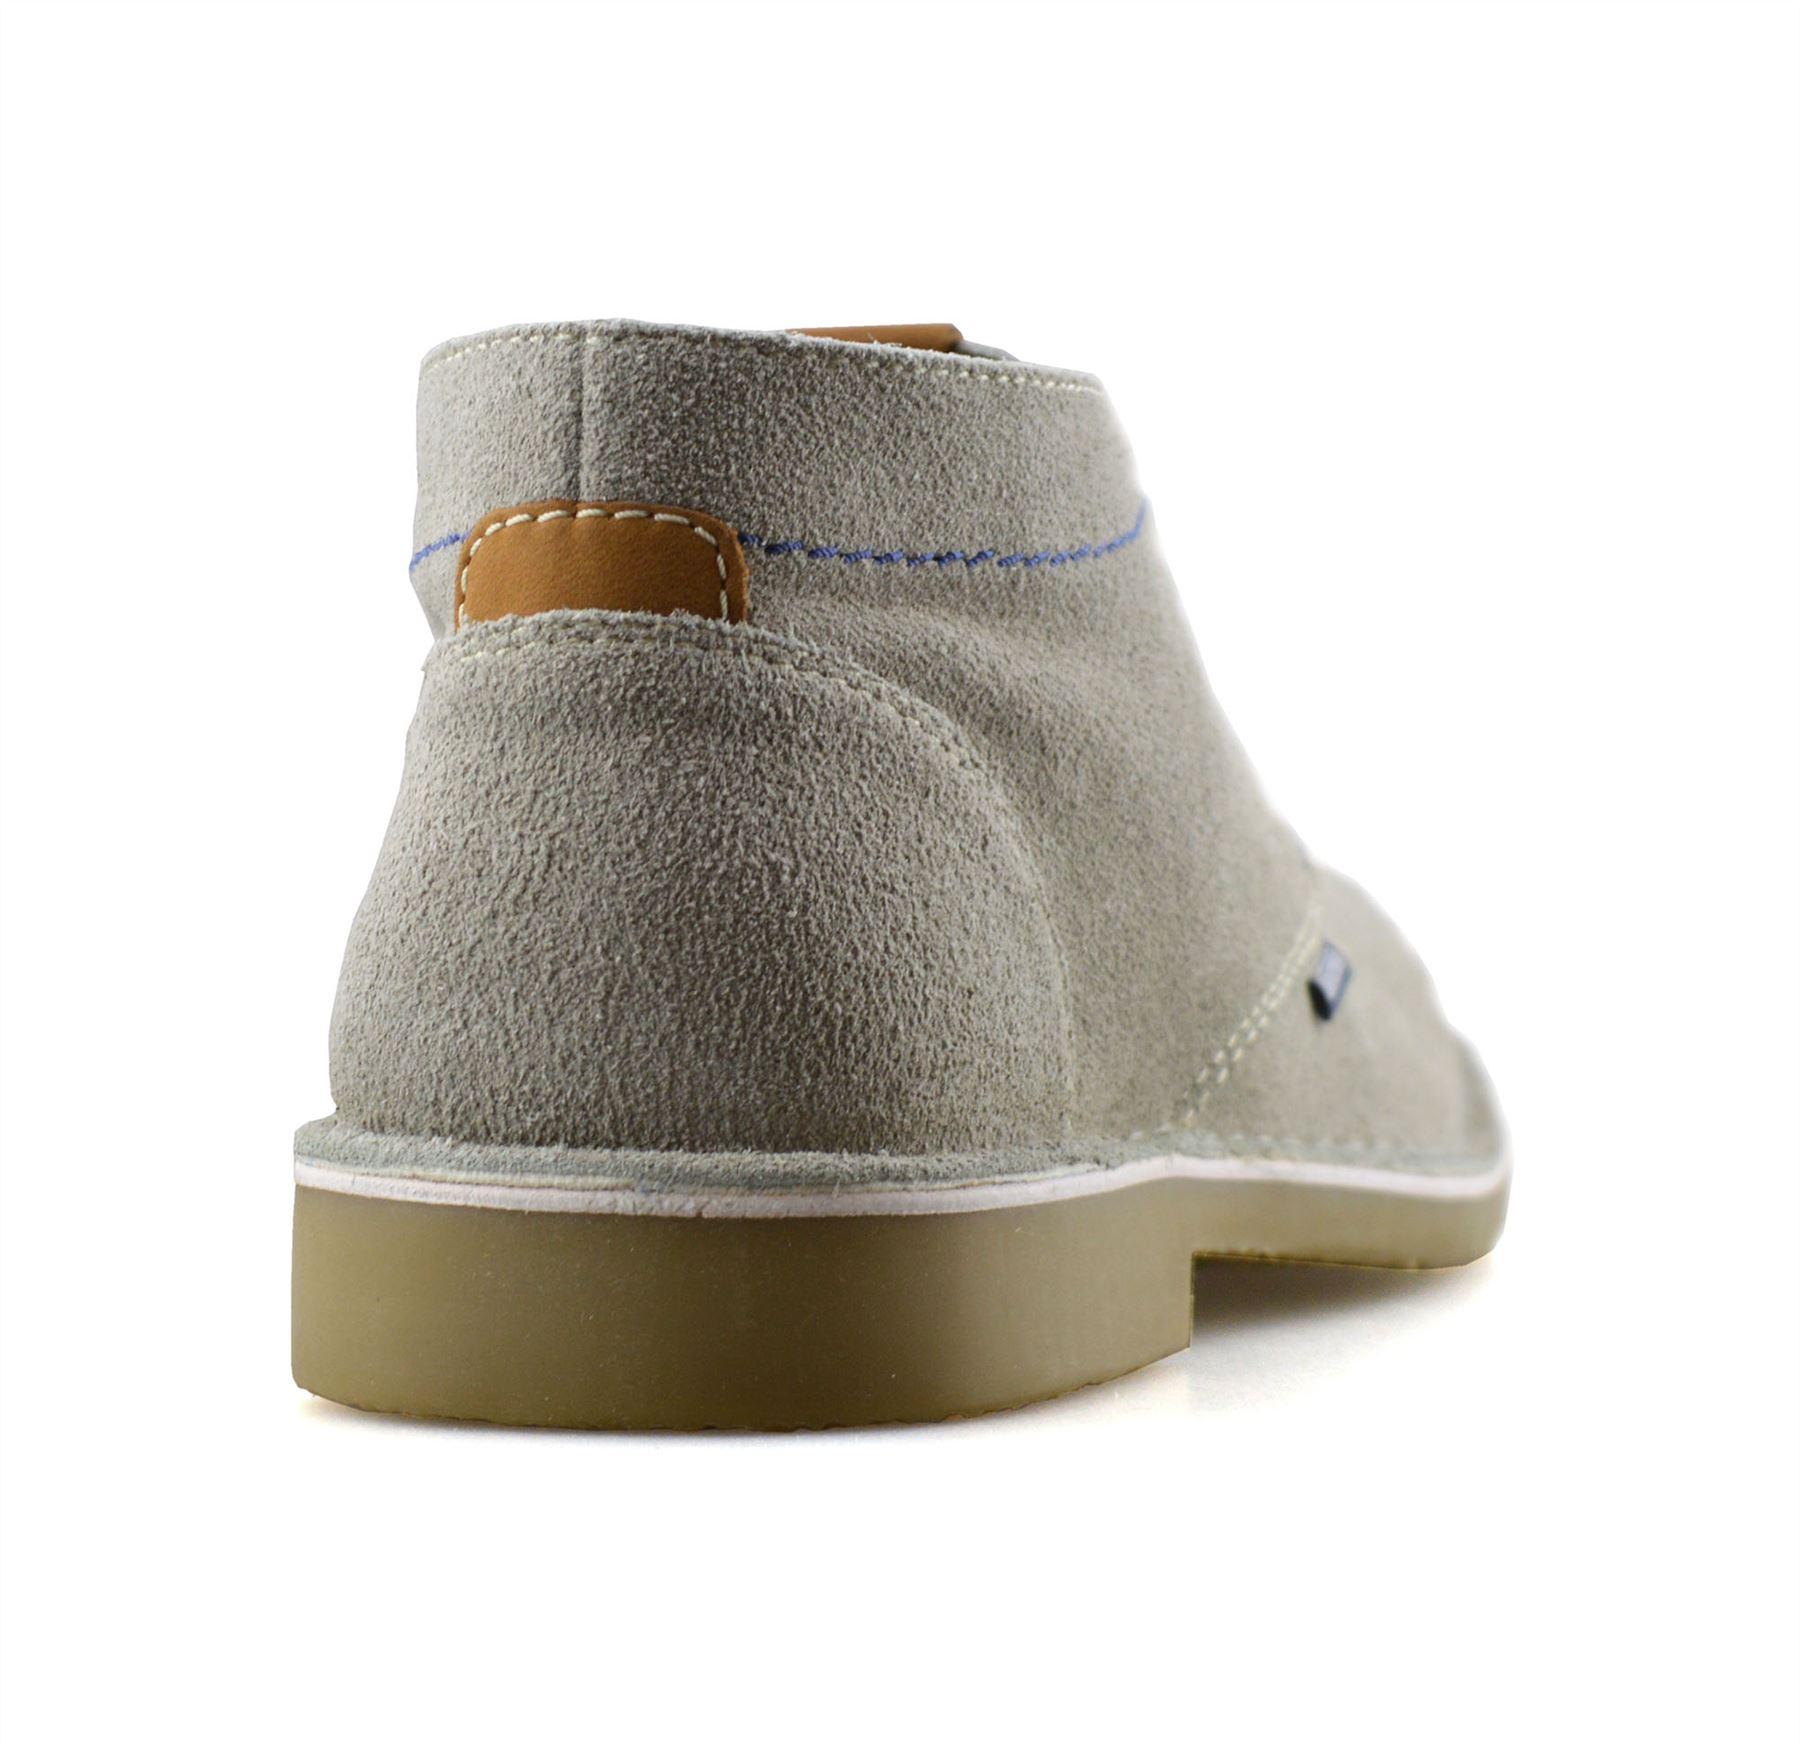 Homme-Lambretta-Cuir-Daim-Decontracte-Chukka-a-Lacets-Desert-Bottes-Chaussures-Taille miniature 9